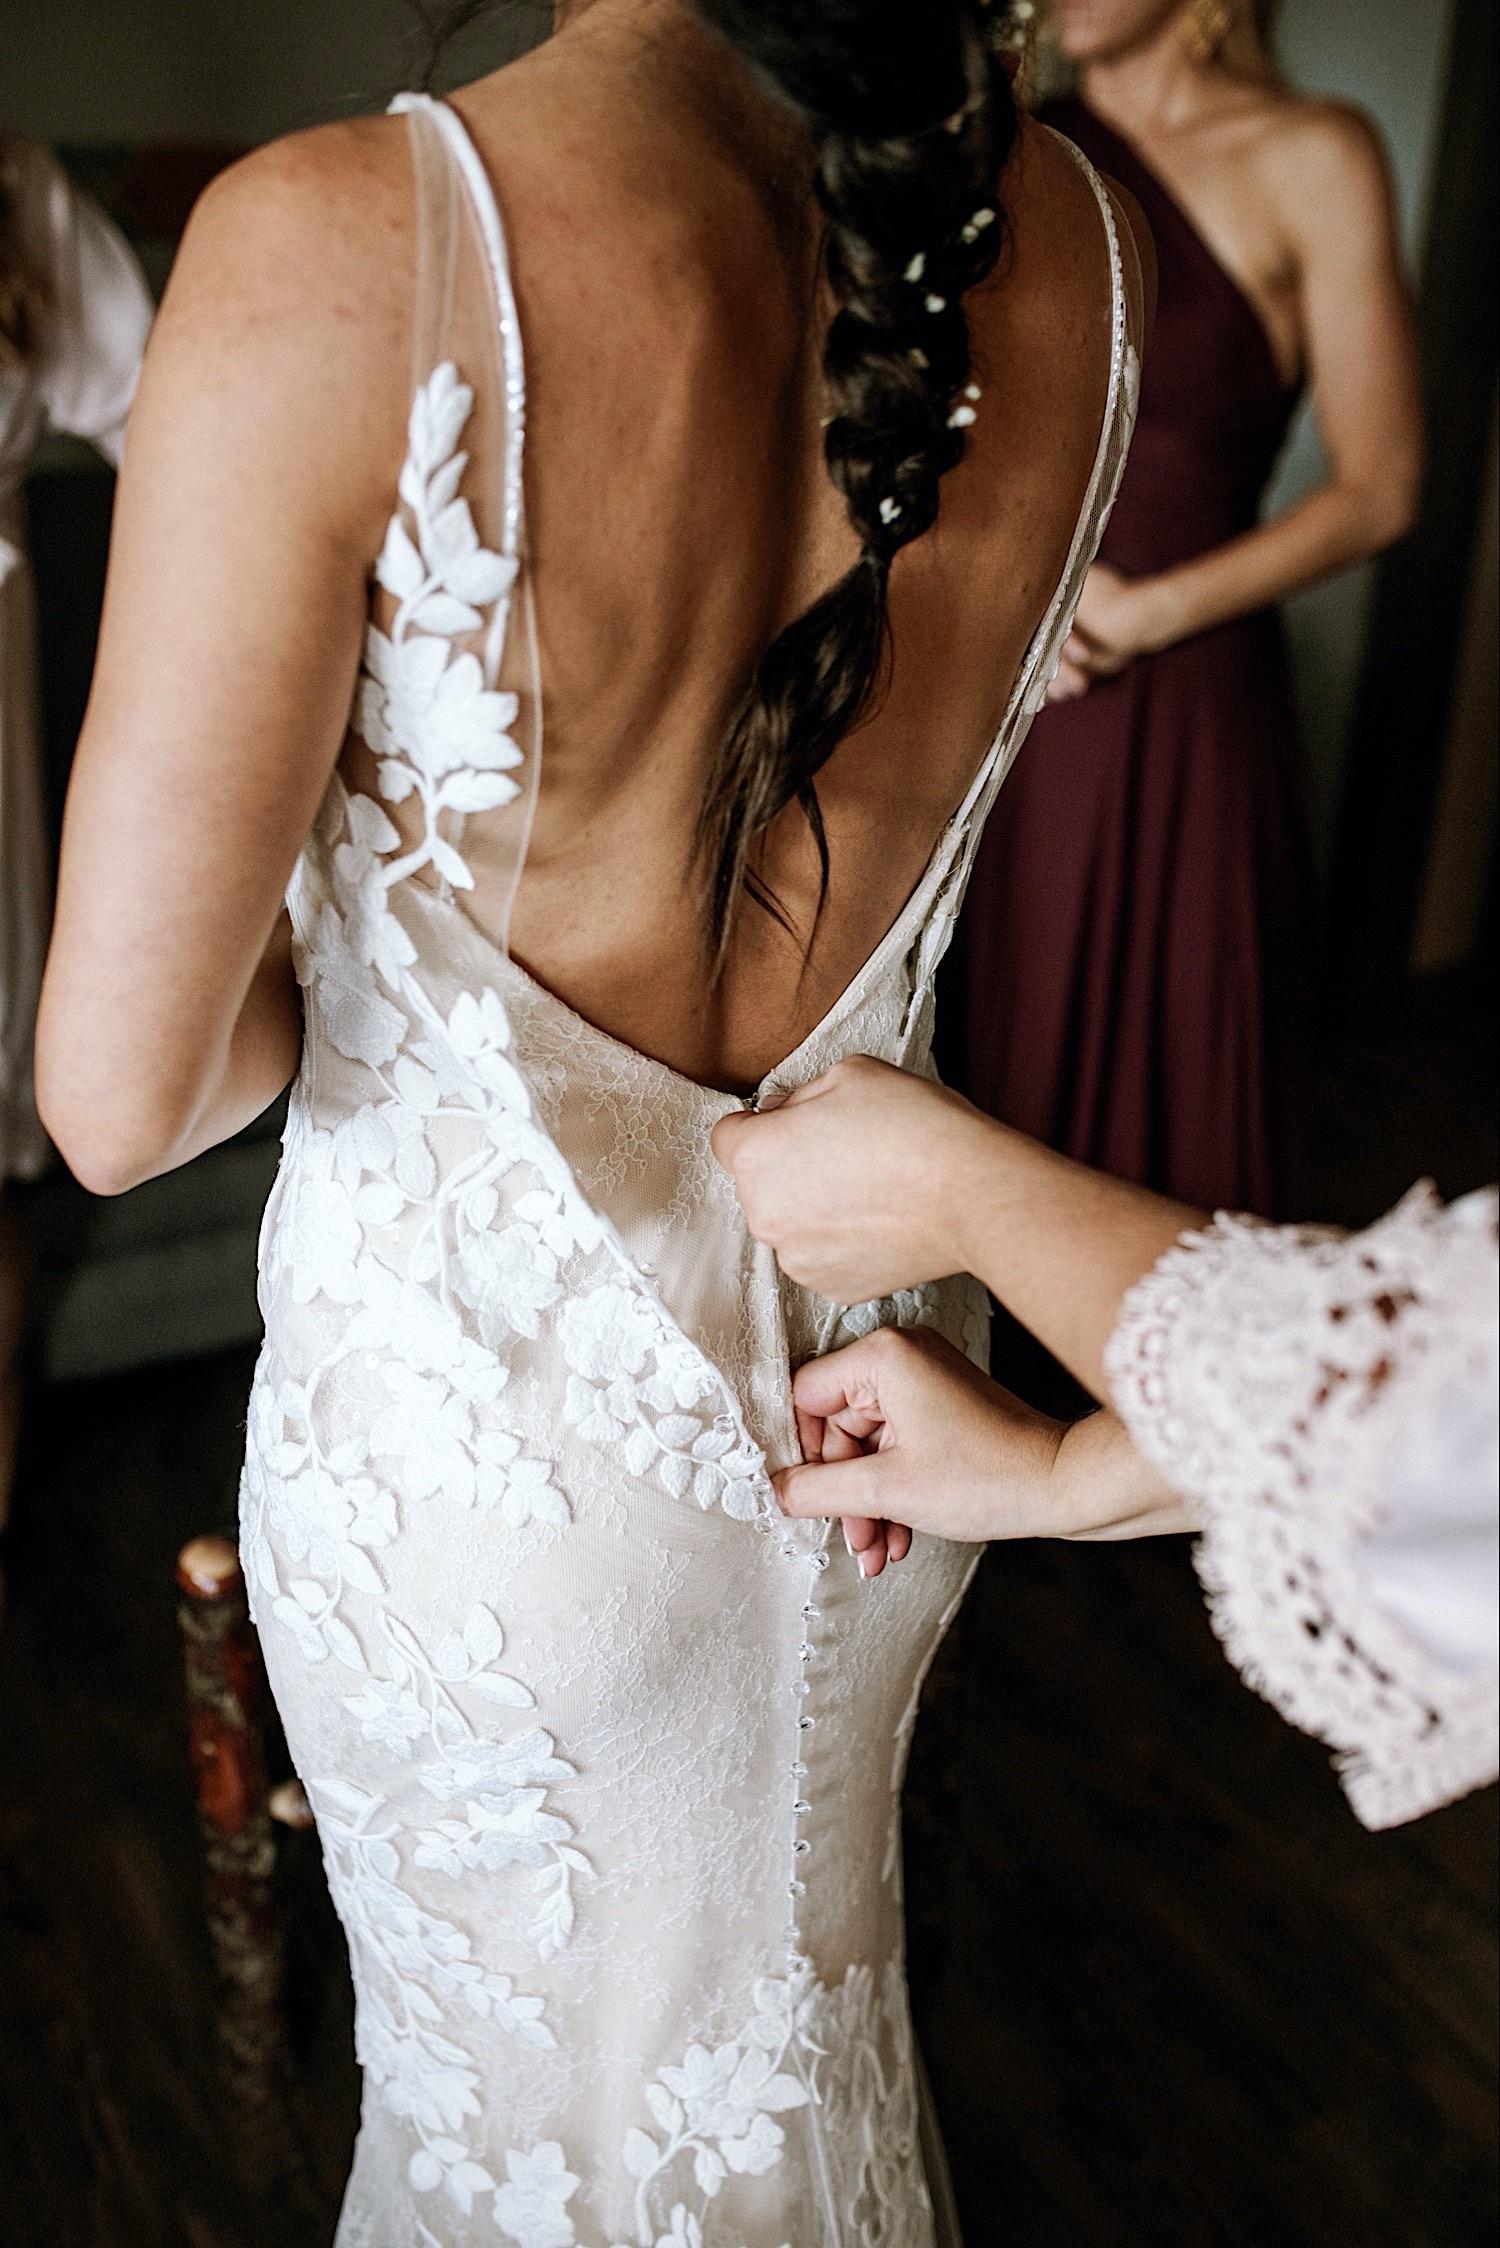 Bomoseen Lodge Wedding - Zipping up the back of bride's wedding dress